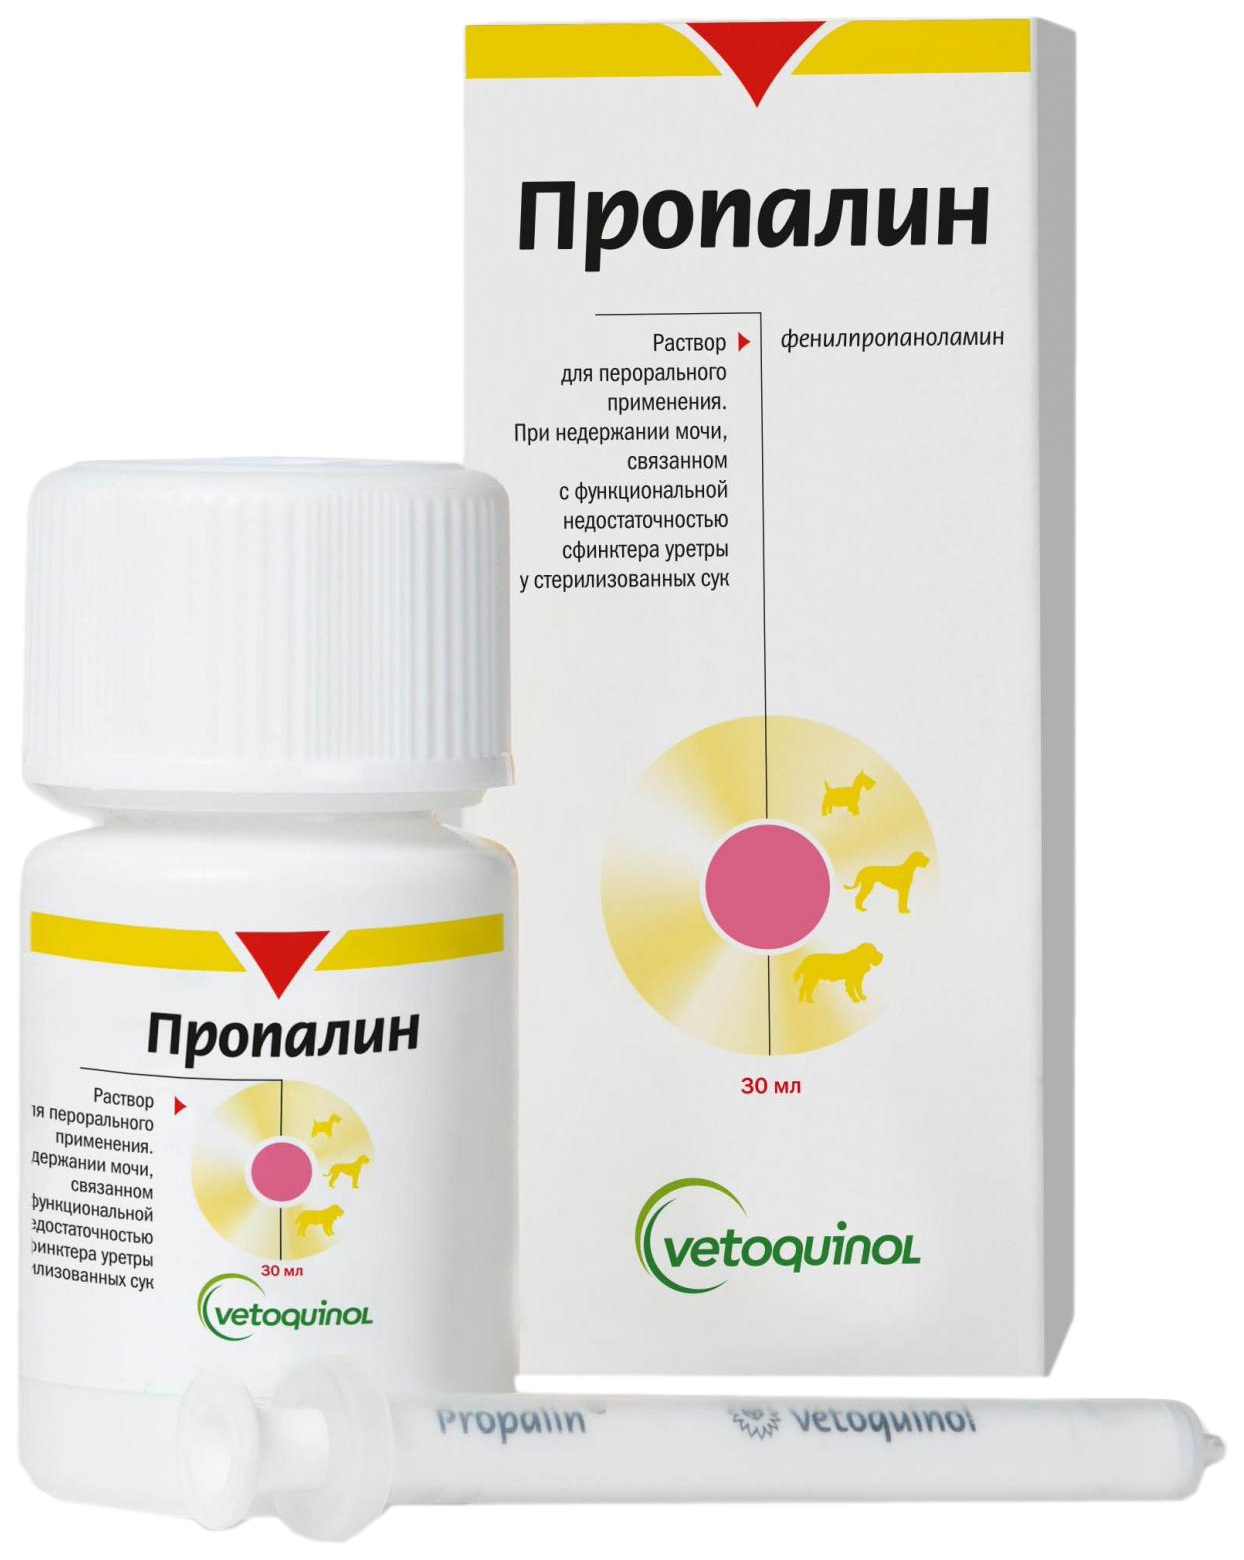 VETOQUINOL Пропалин сироп для собак 30 мл